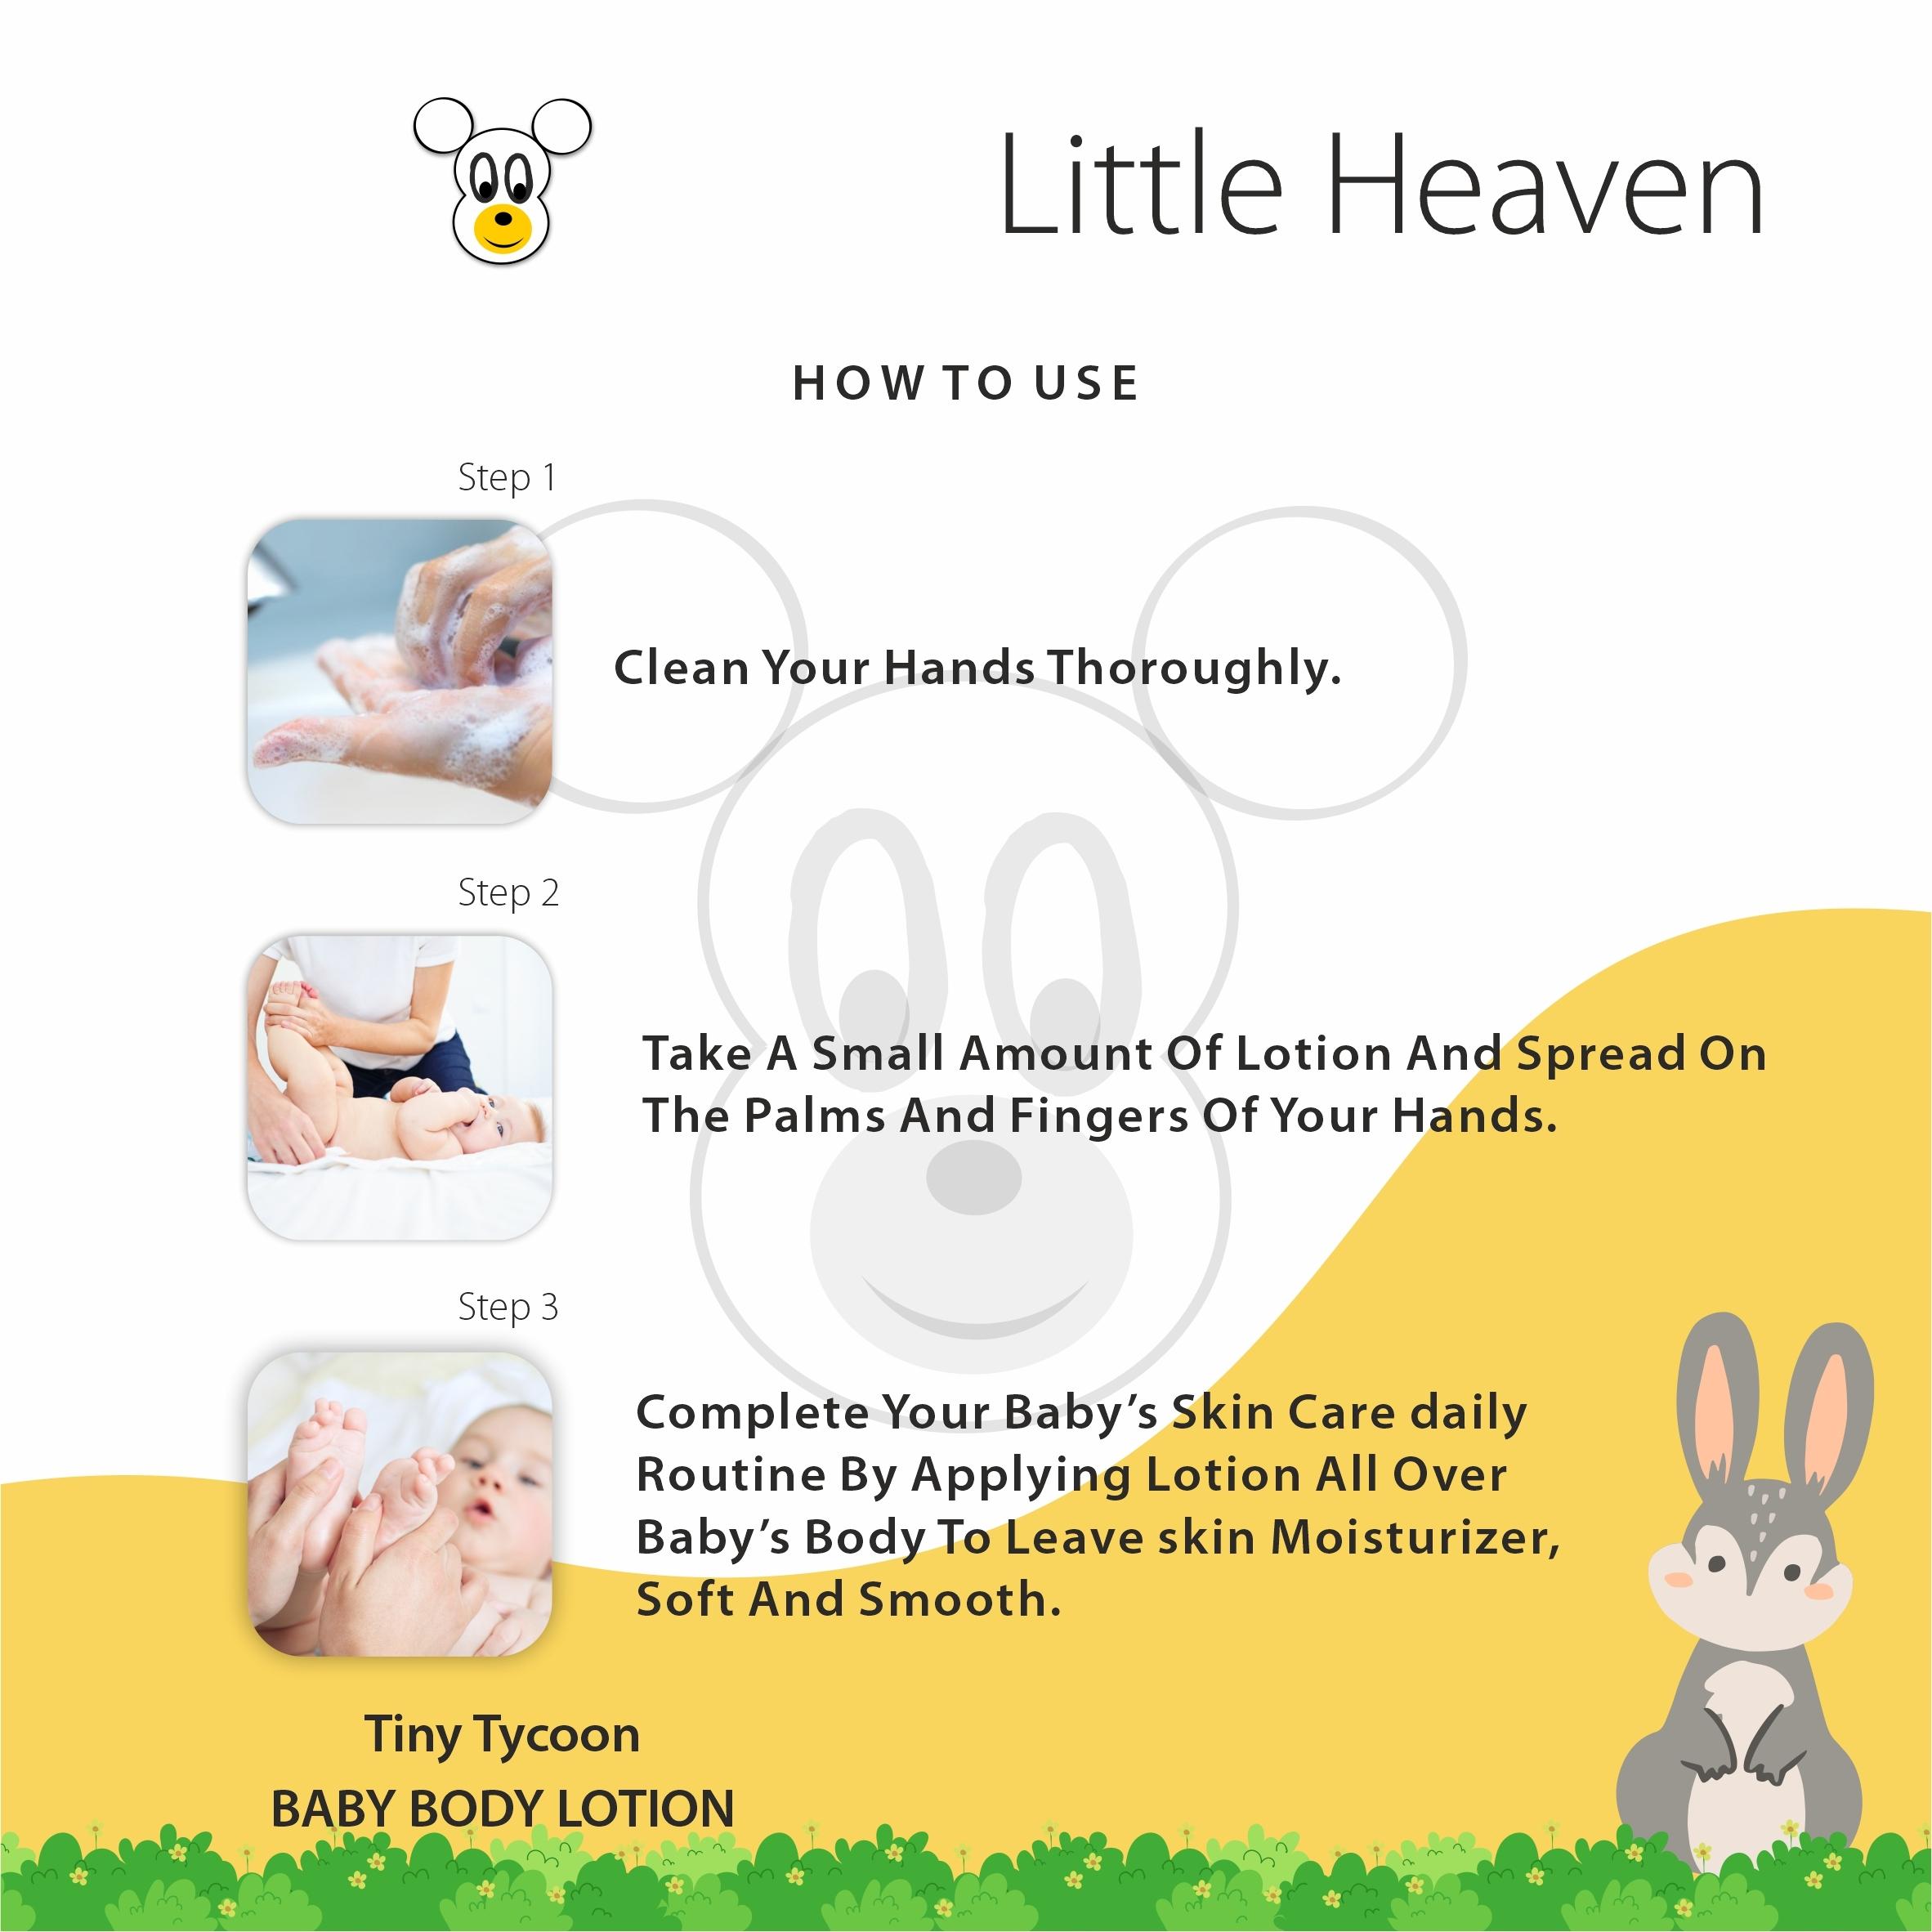 250 ml Tiny Tycoon Paris Baby Body Lotion